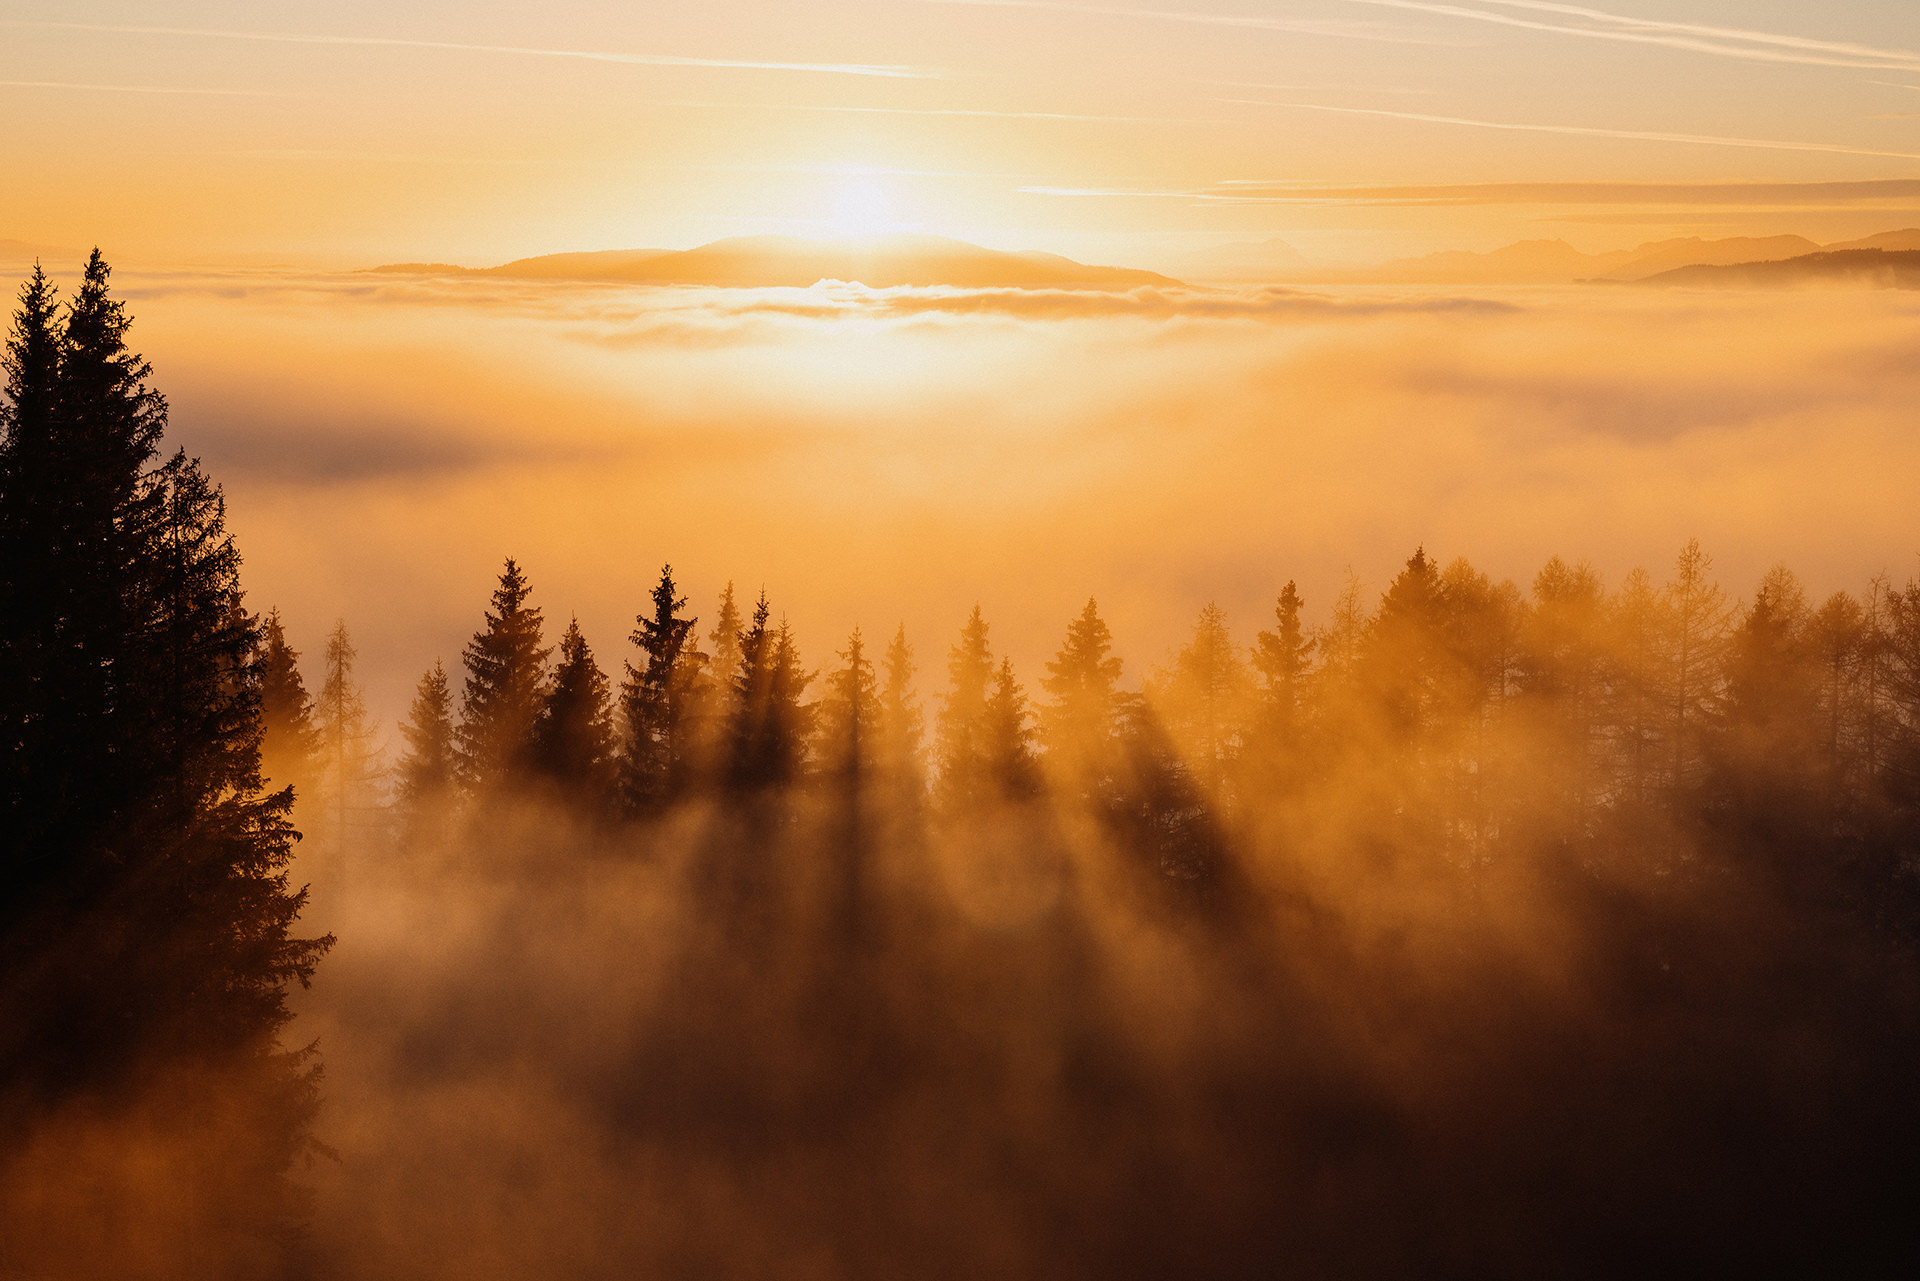 baueme-berge-nebel-sonnenuntergang